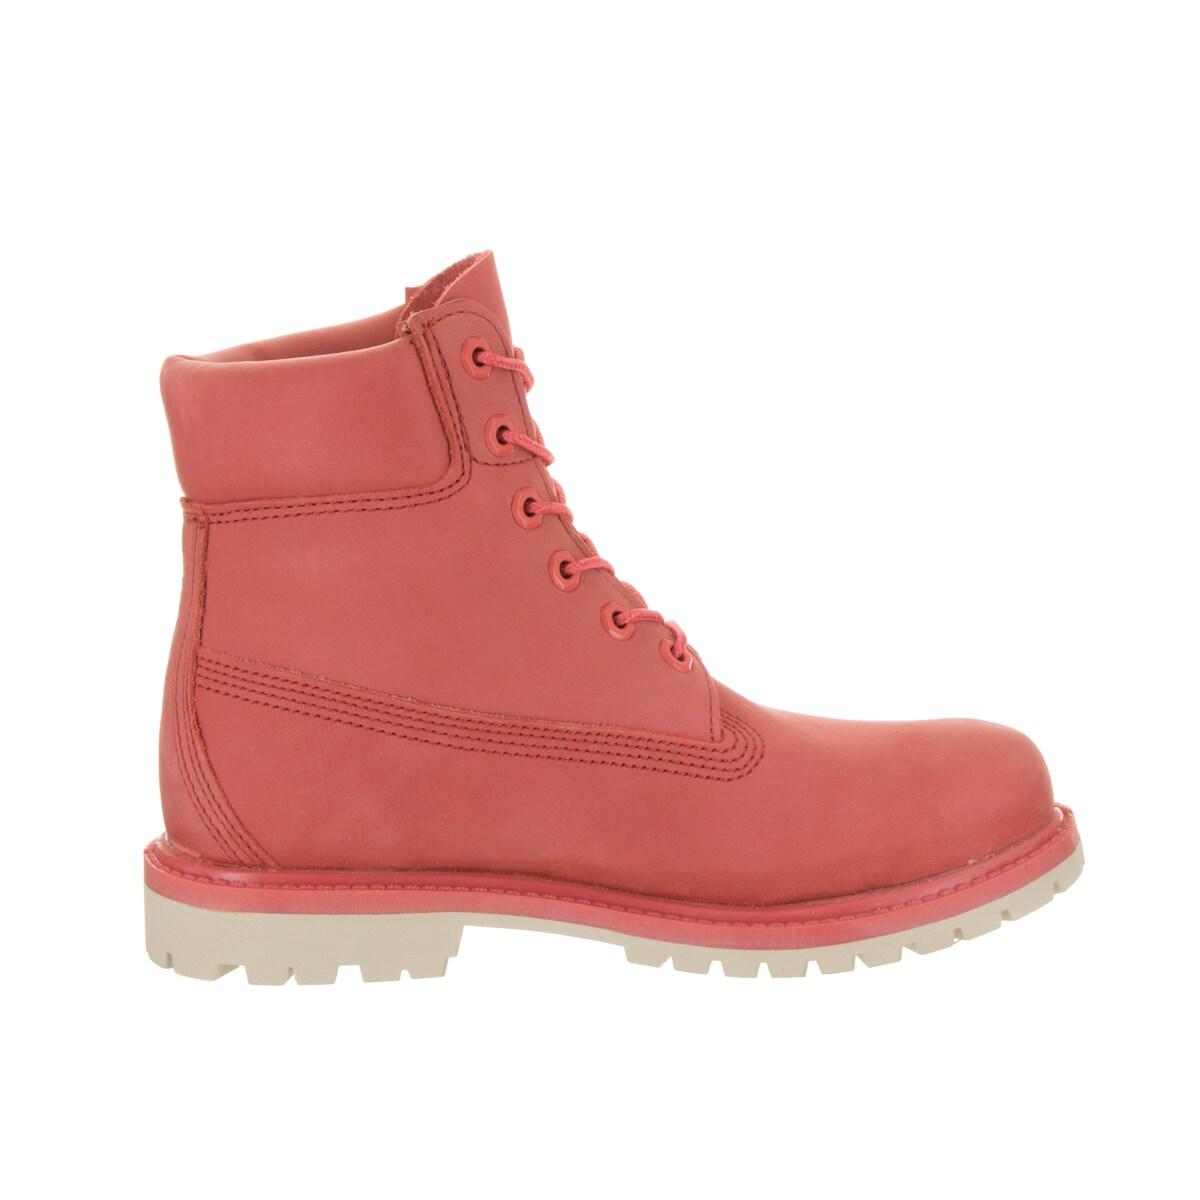 Shop Timberland Women's AF Pink Nubuck 6 inch Premium WP